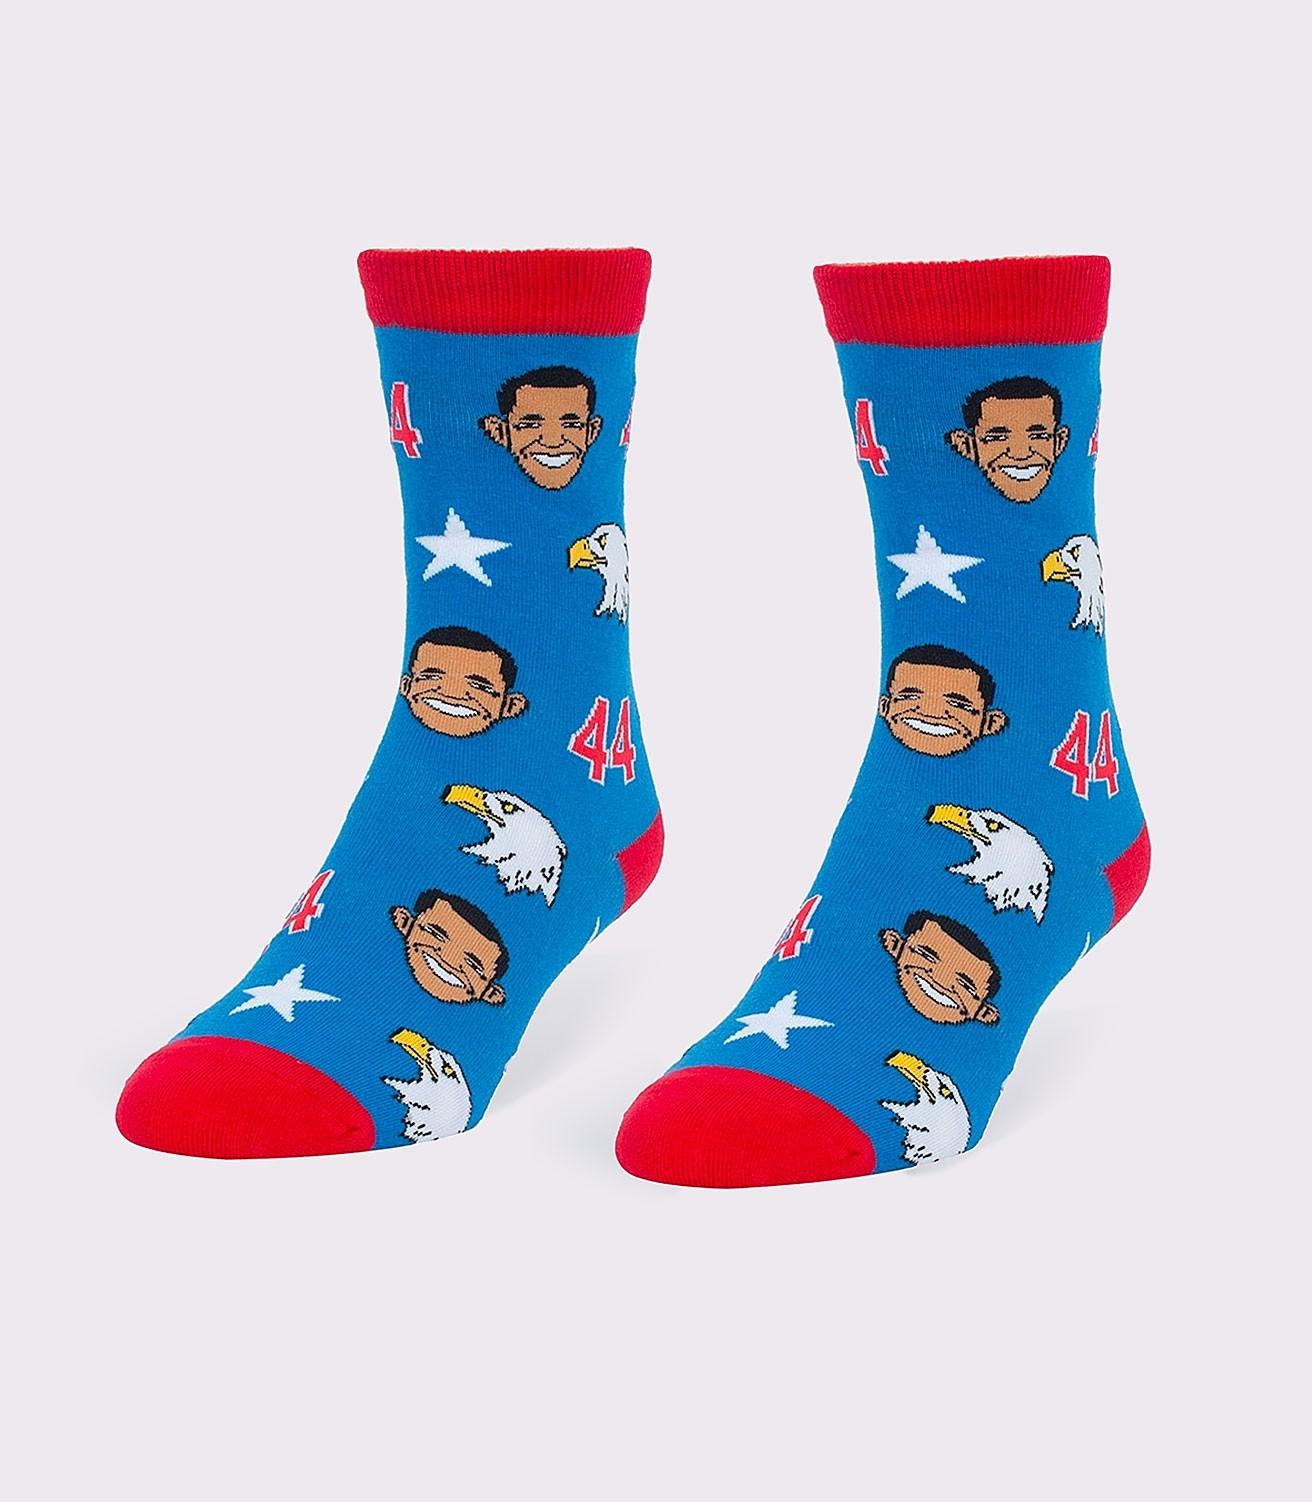 79205dea Obamas & Eagles Women's Socks